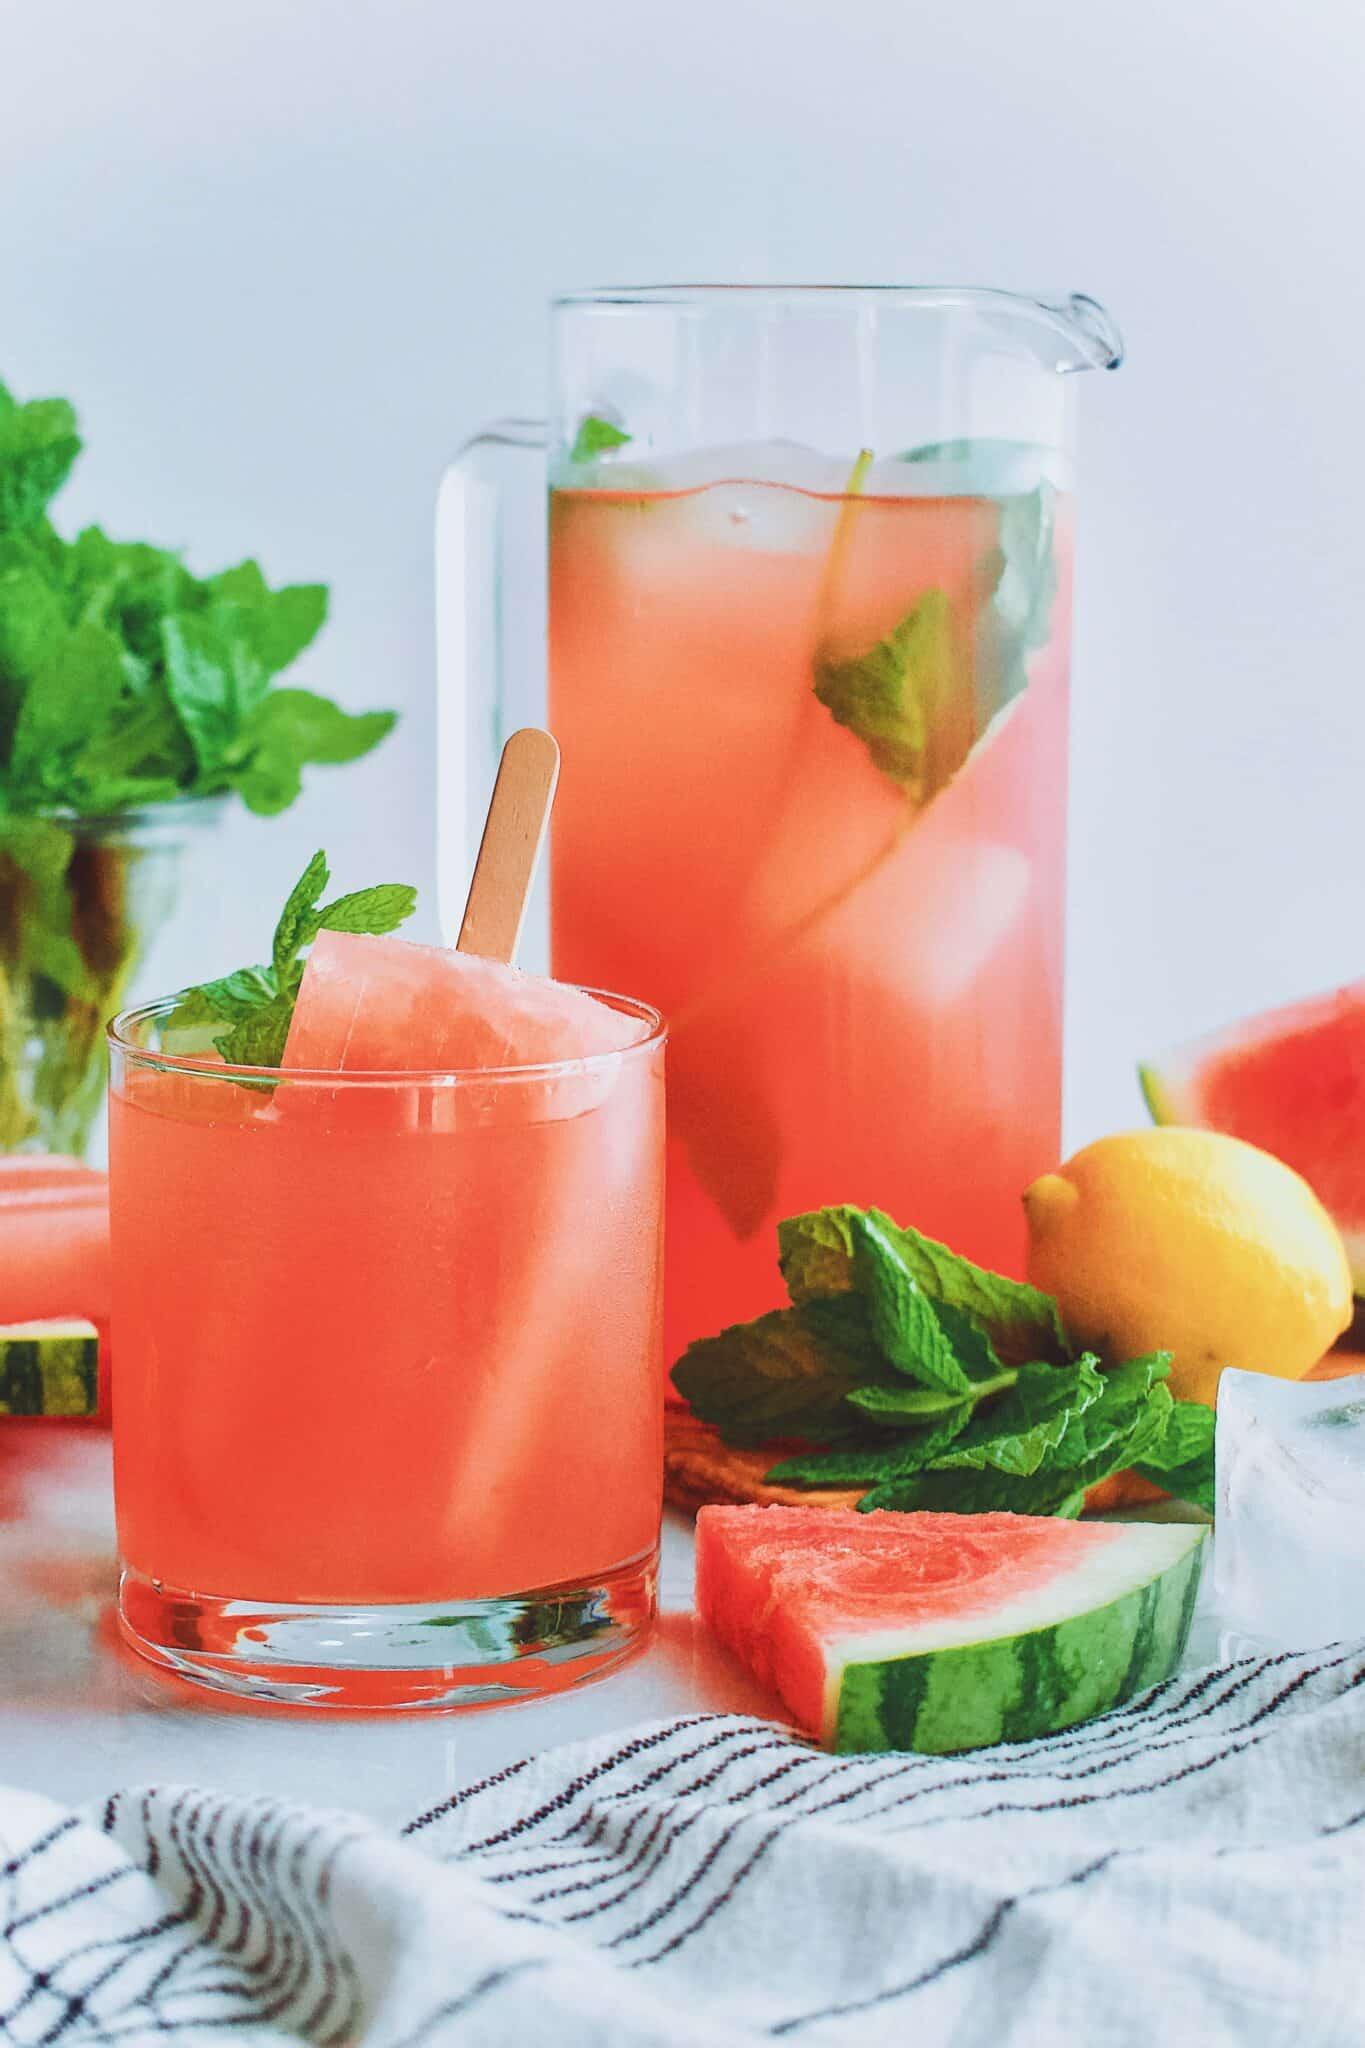 Watermelon Lemonade and Popsicles